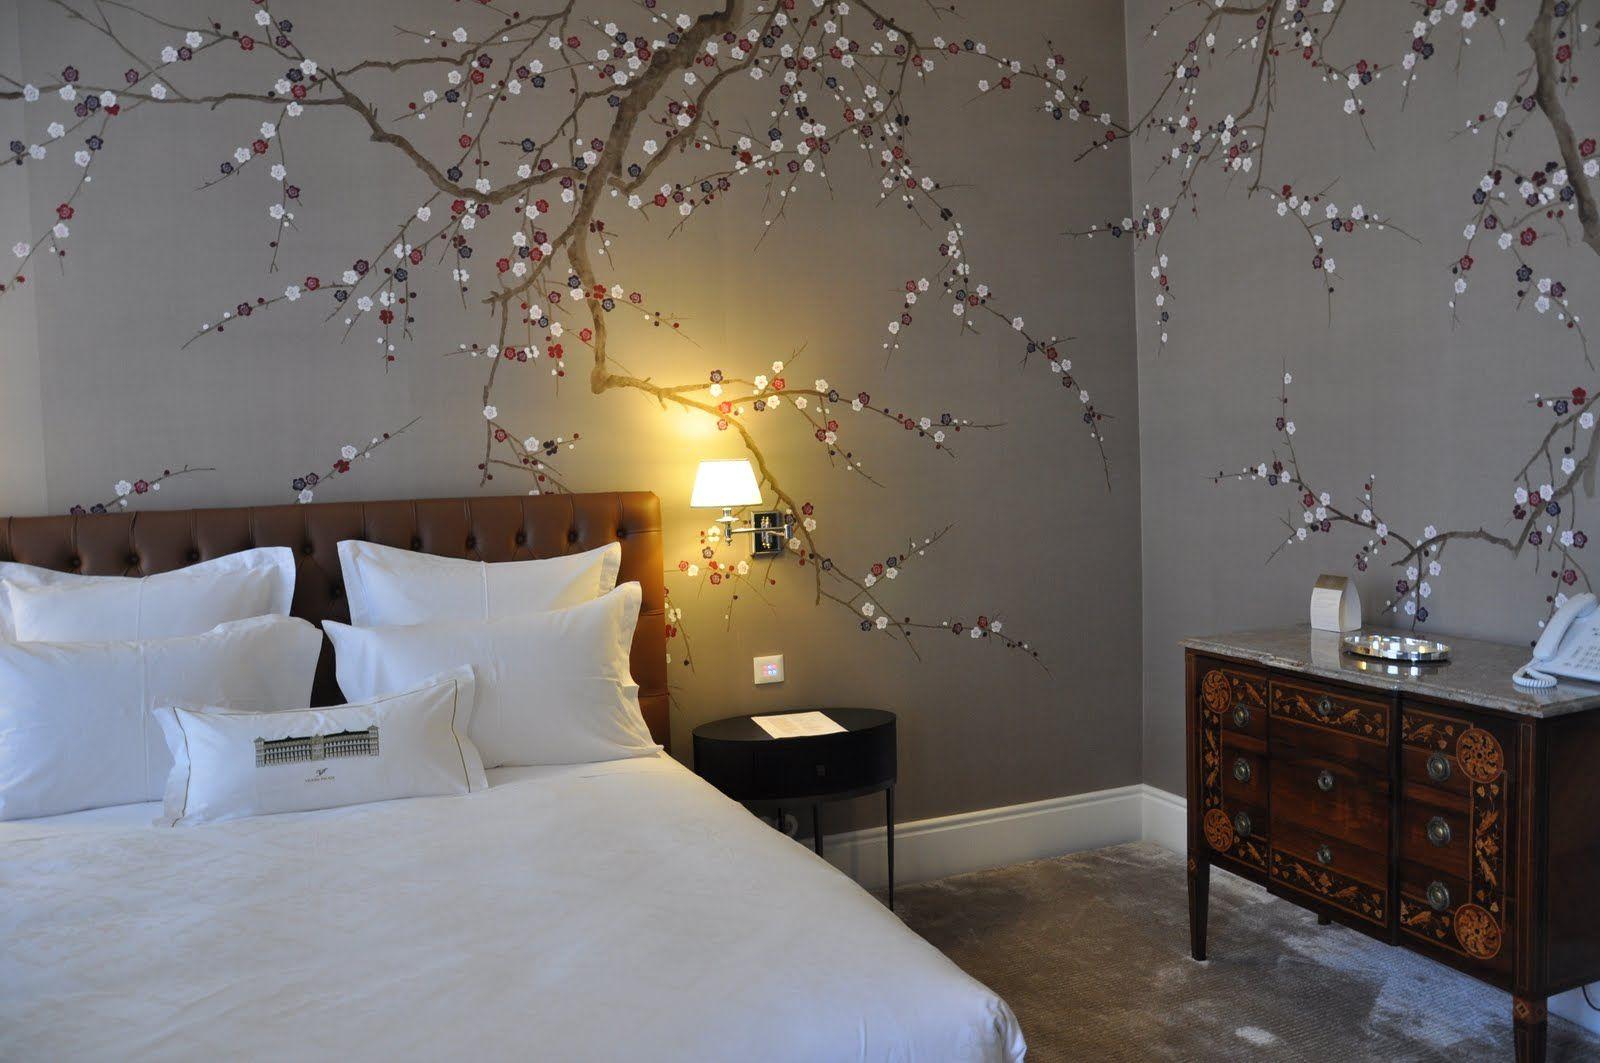 Cherry blossom wall art love decor i want pinterest for Cherry blossom bedroom ideas